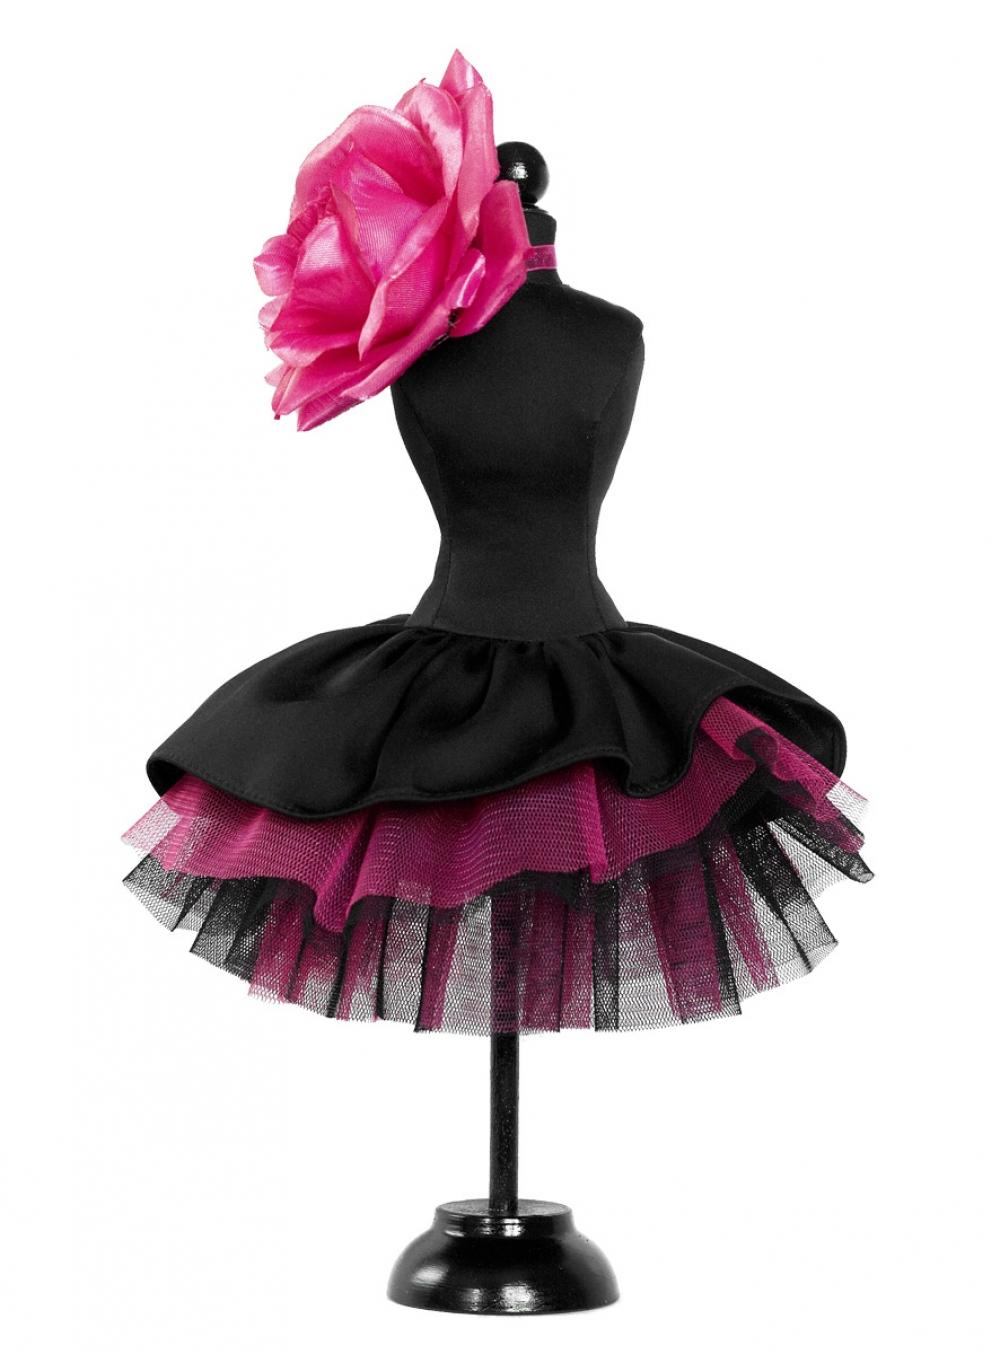 Статуэтка платье